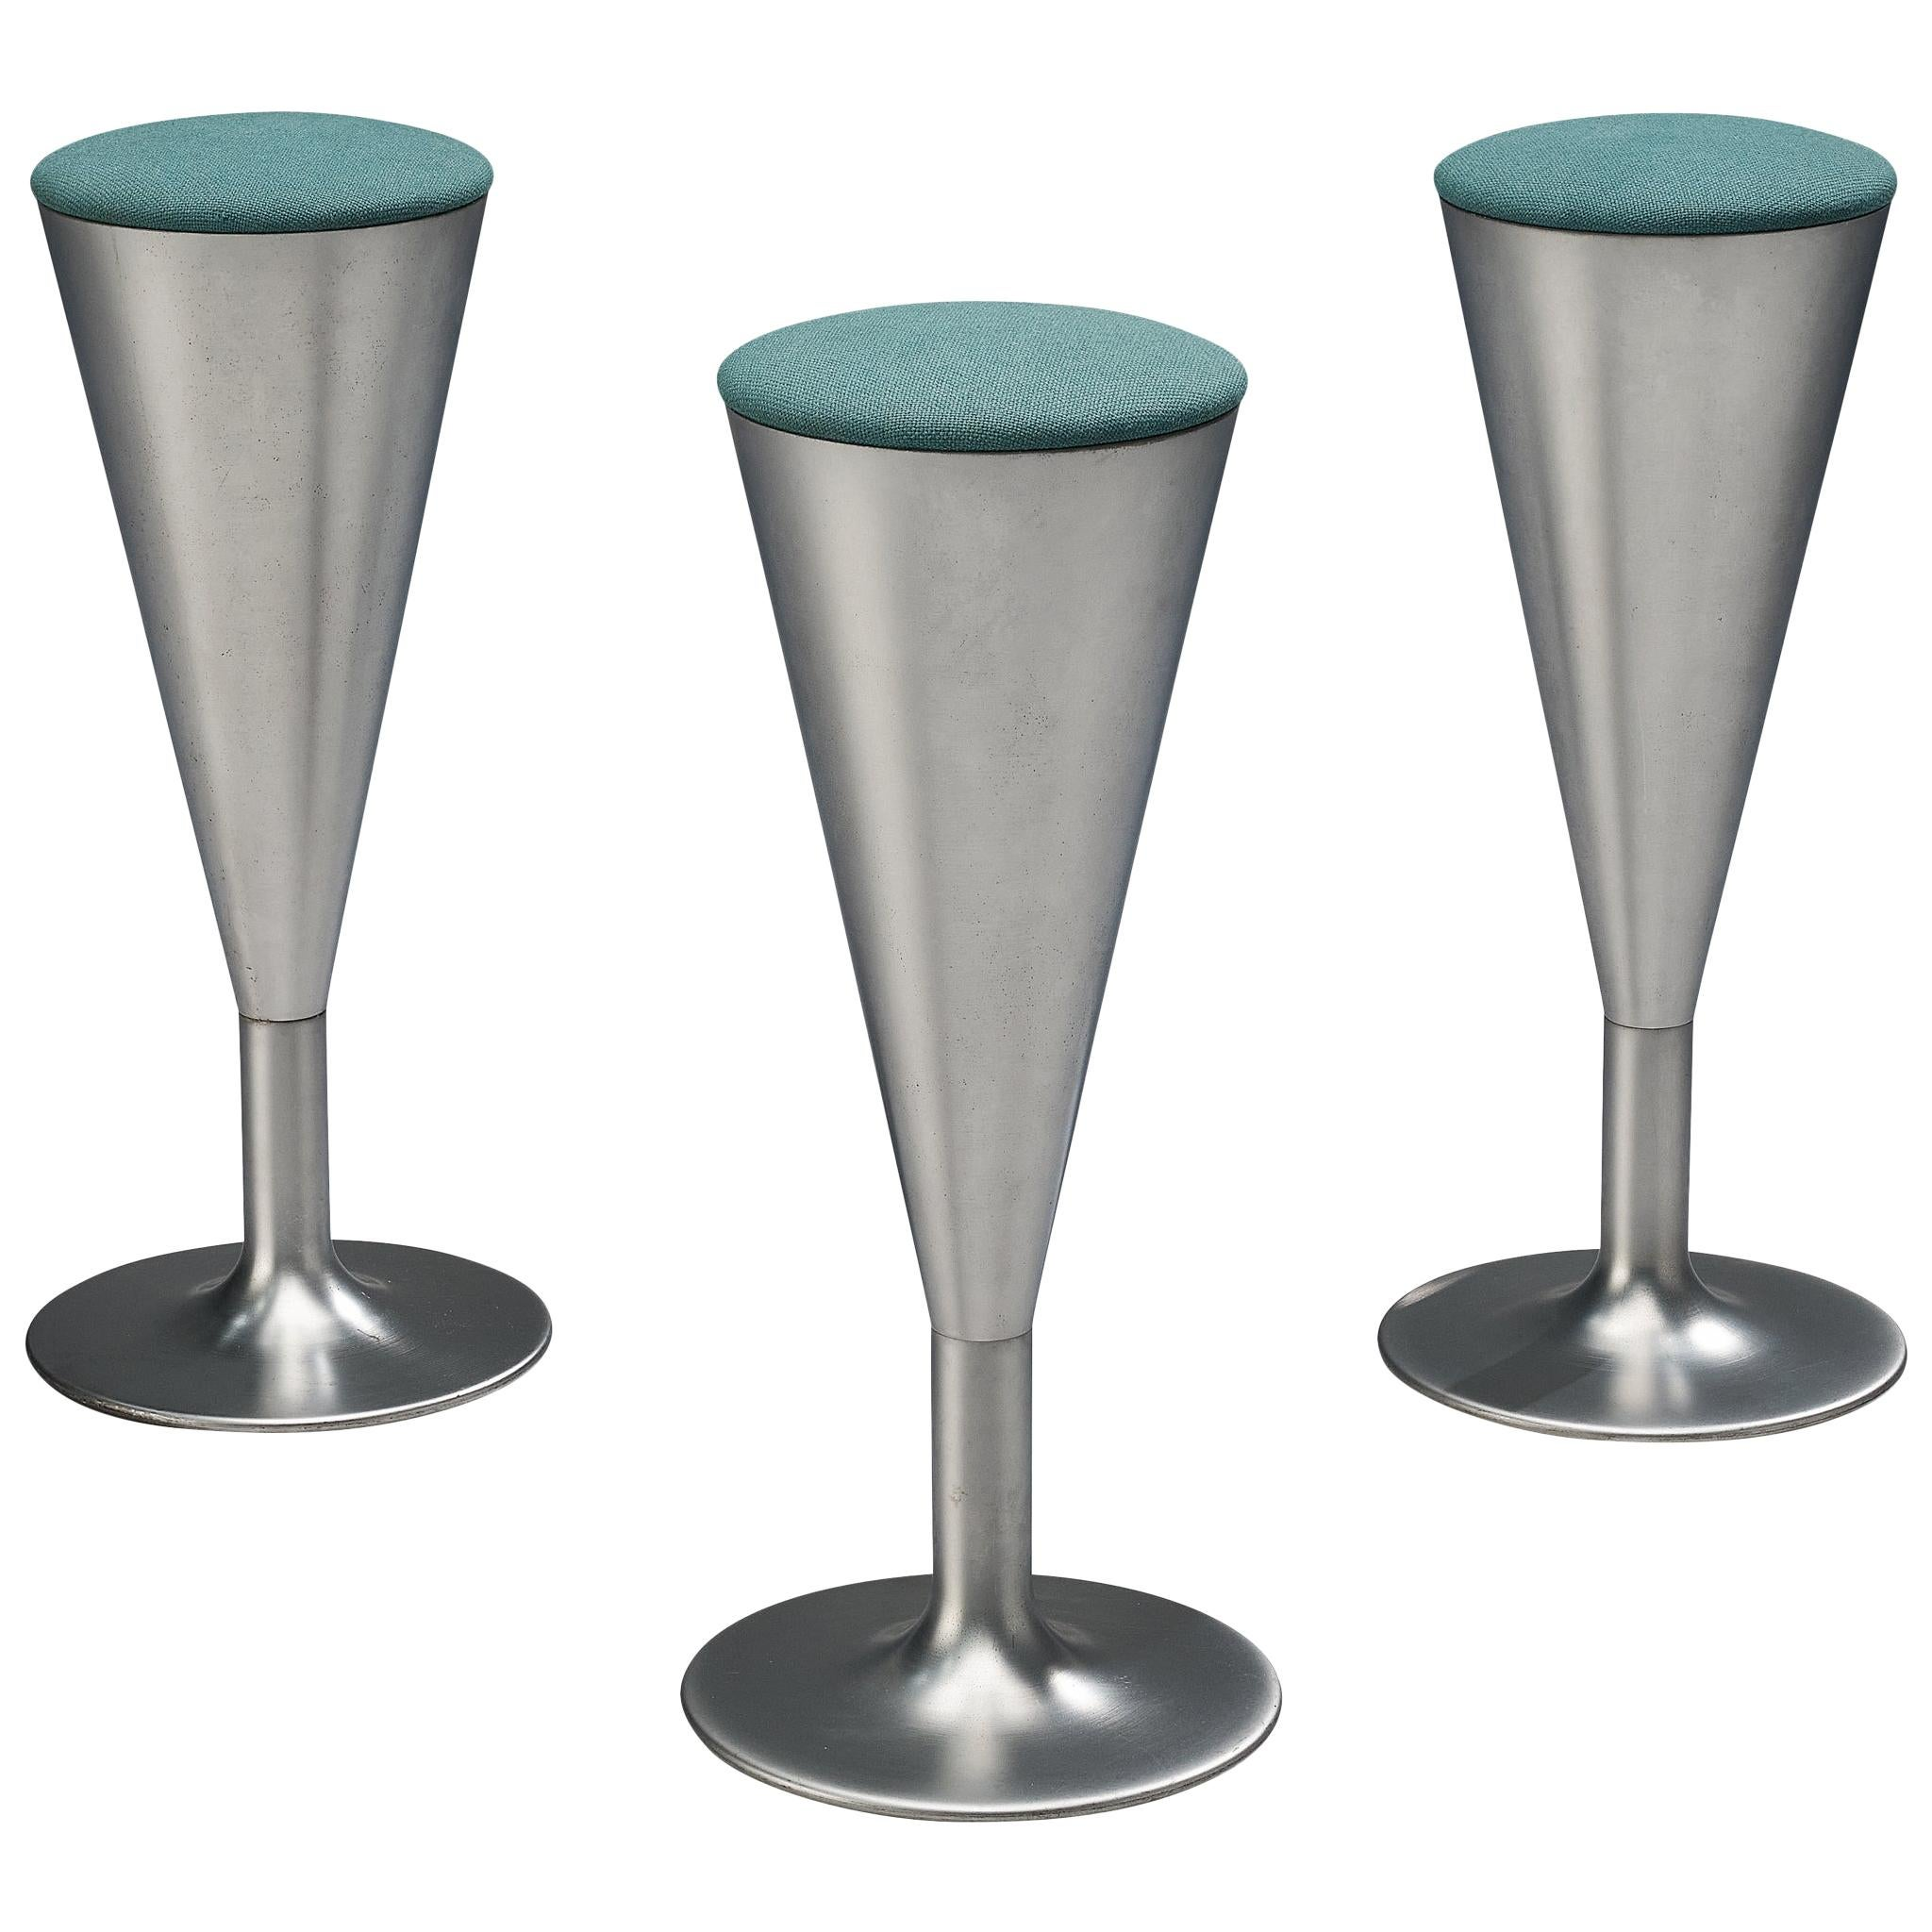 Leo Thafvelin for Johanson Design Set of Three Bar Stools